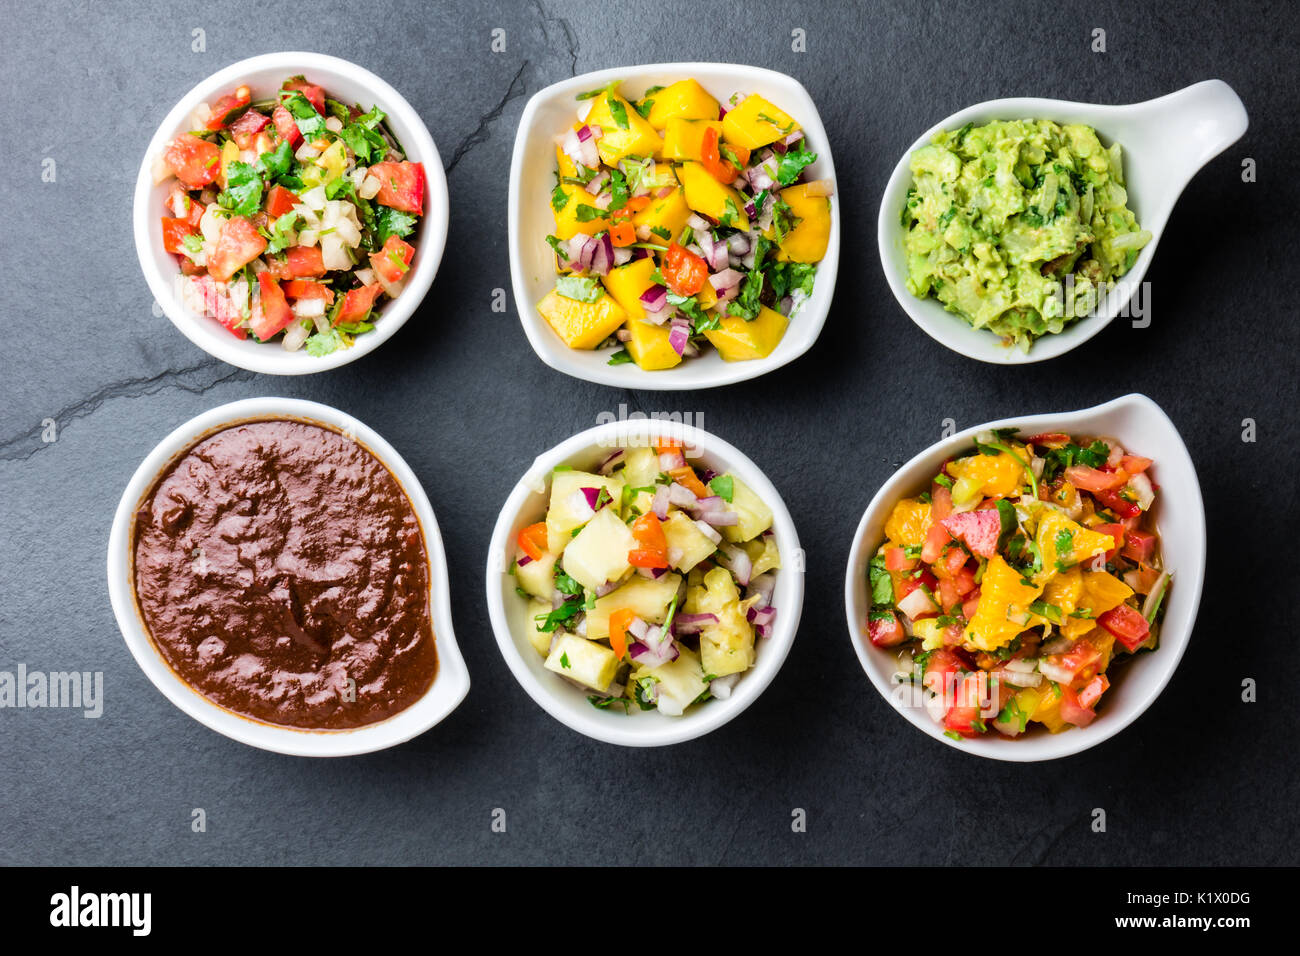 Traditional famous mexican sauces chocolate chili mole poblano, pico de gallo, avocado guacamole, salsa bandera, Stock Photo